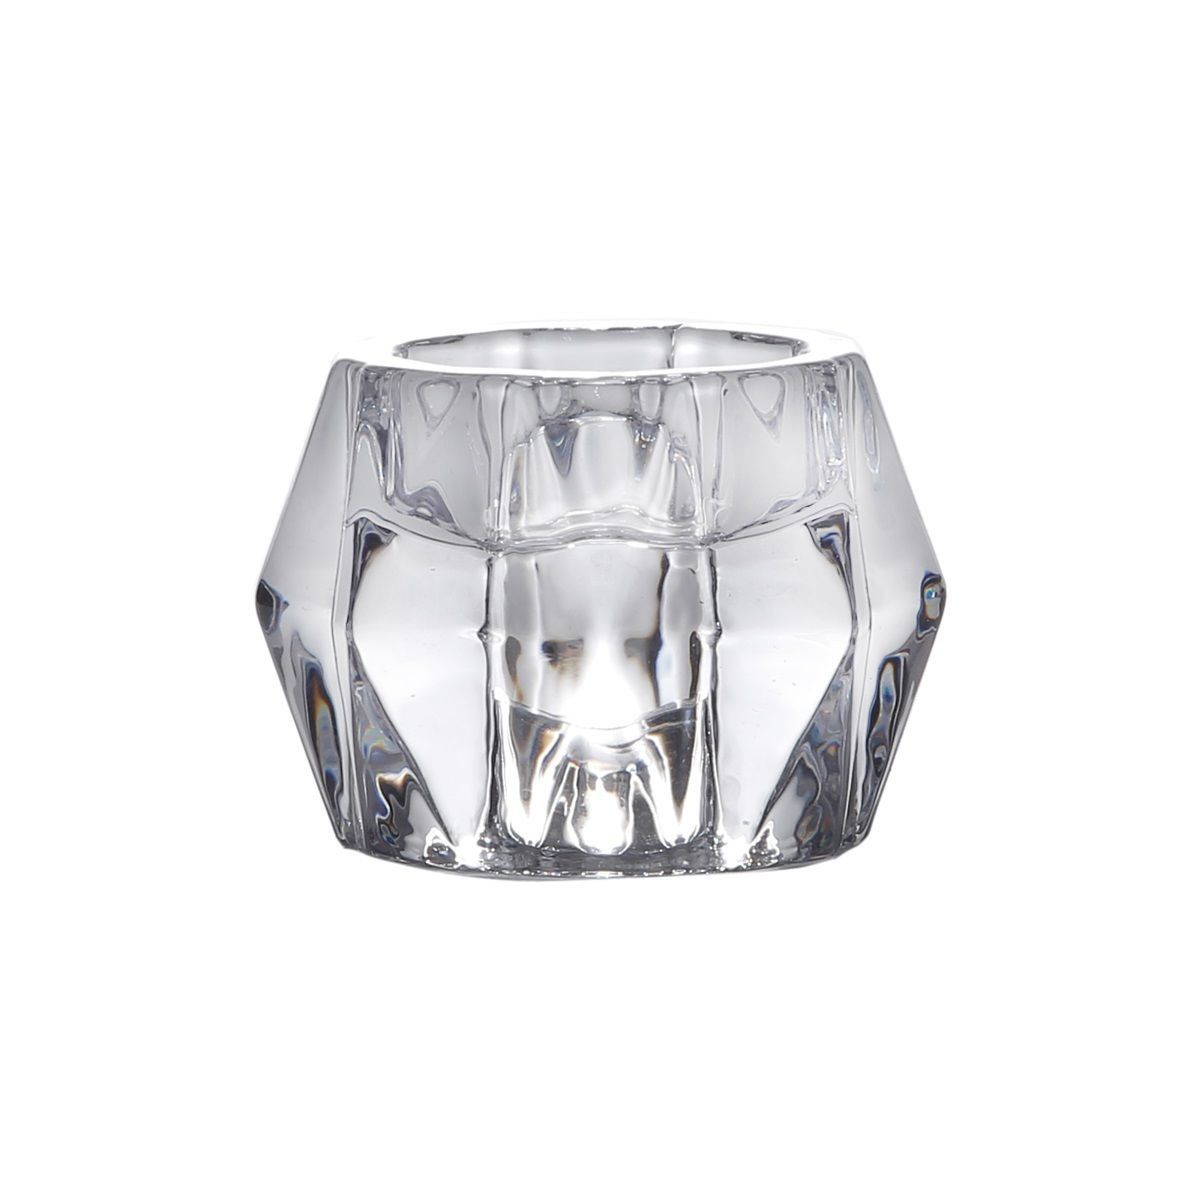 Porta-vela 7,5 cm de vidro transparente Ruy Bon Gourmet - 2277